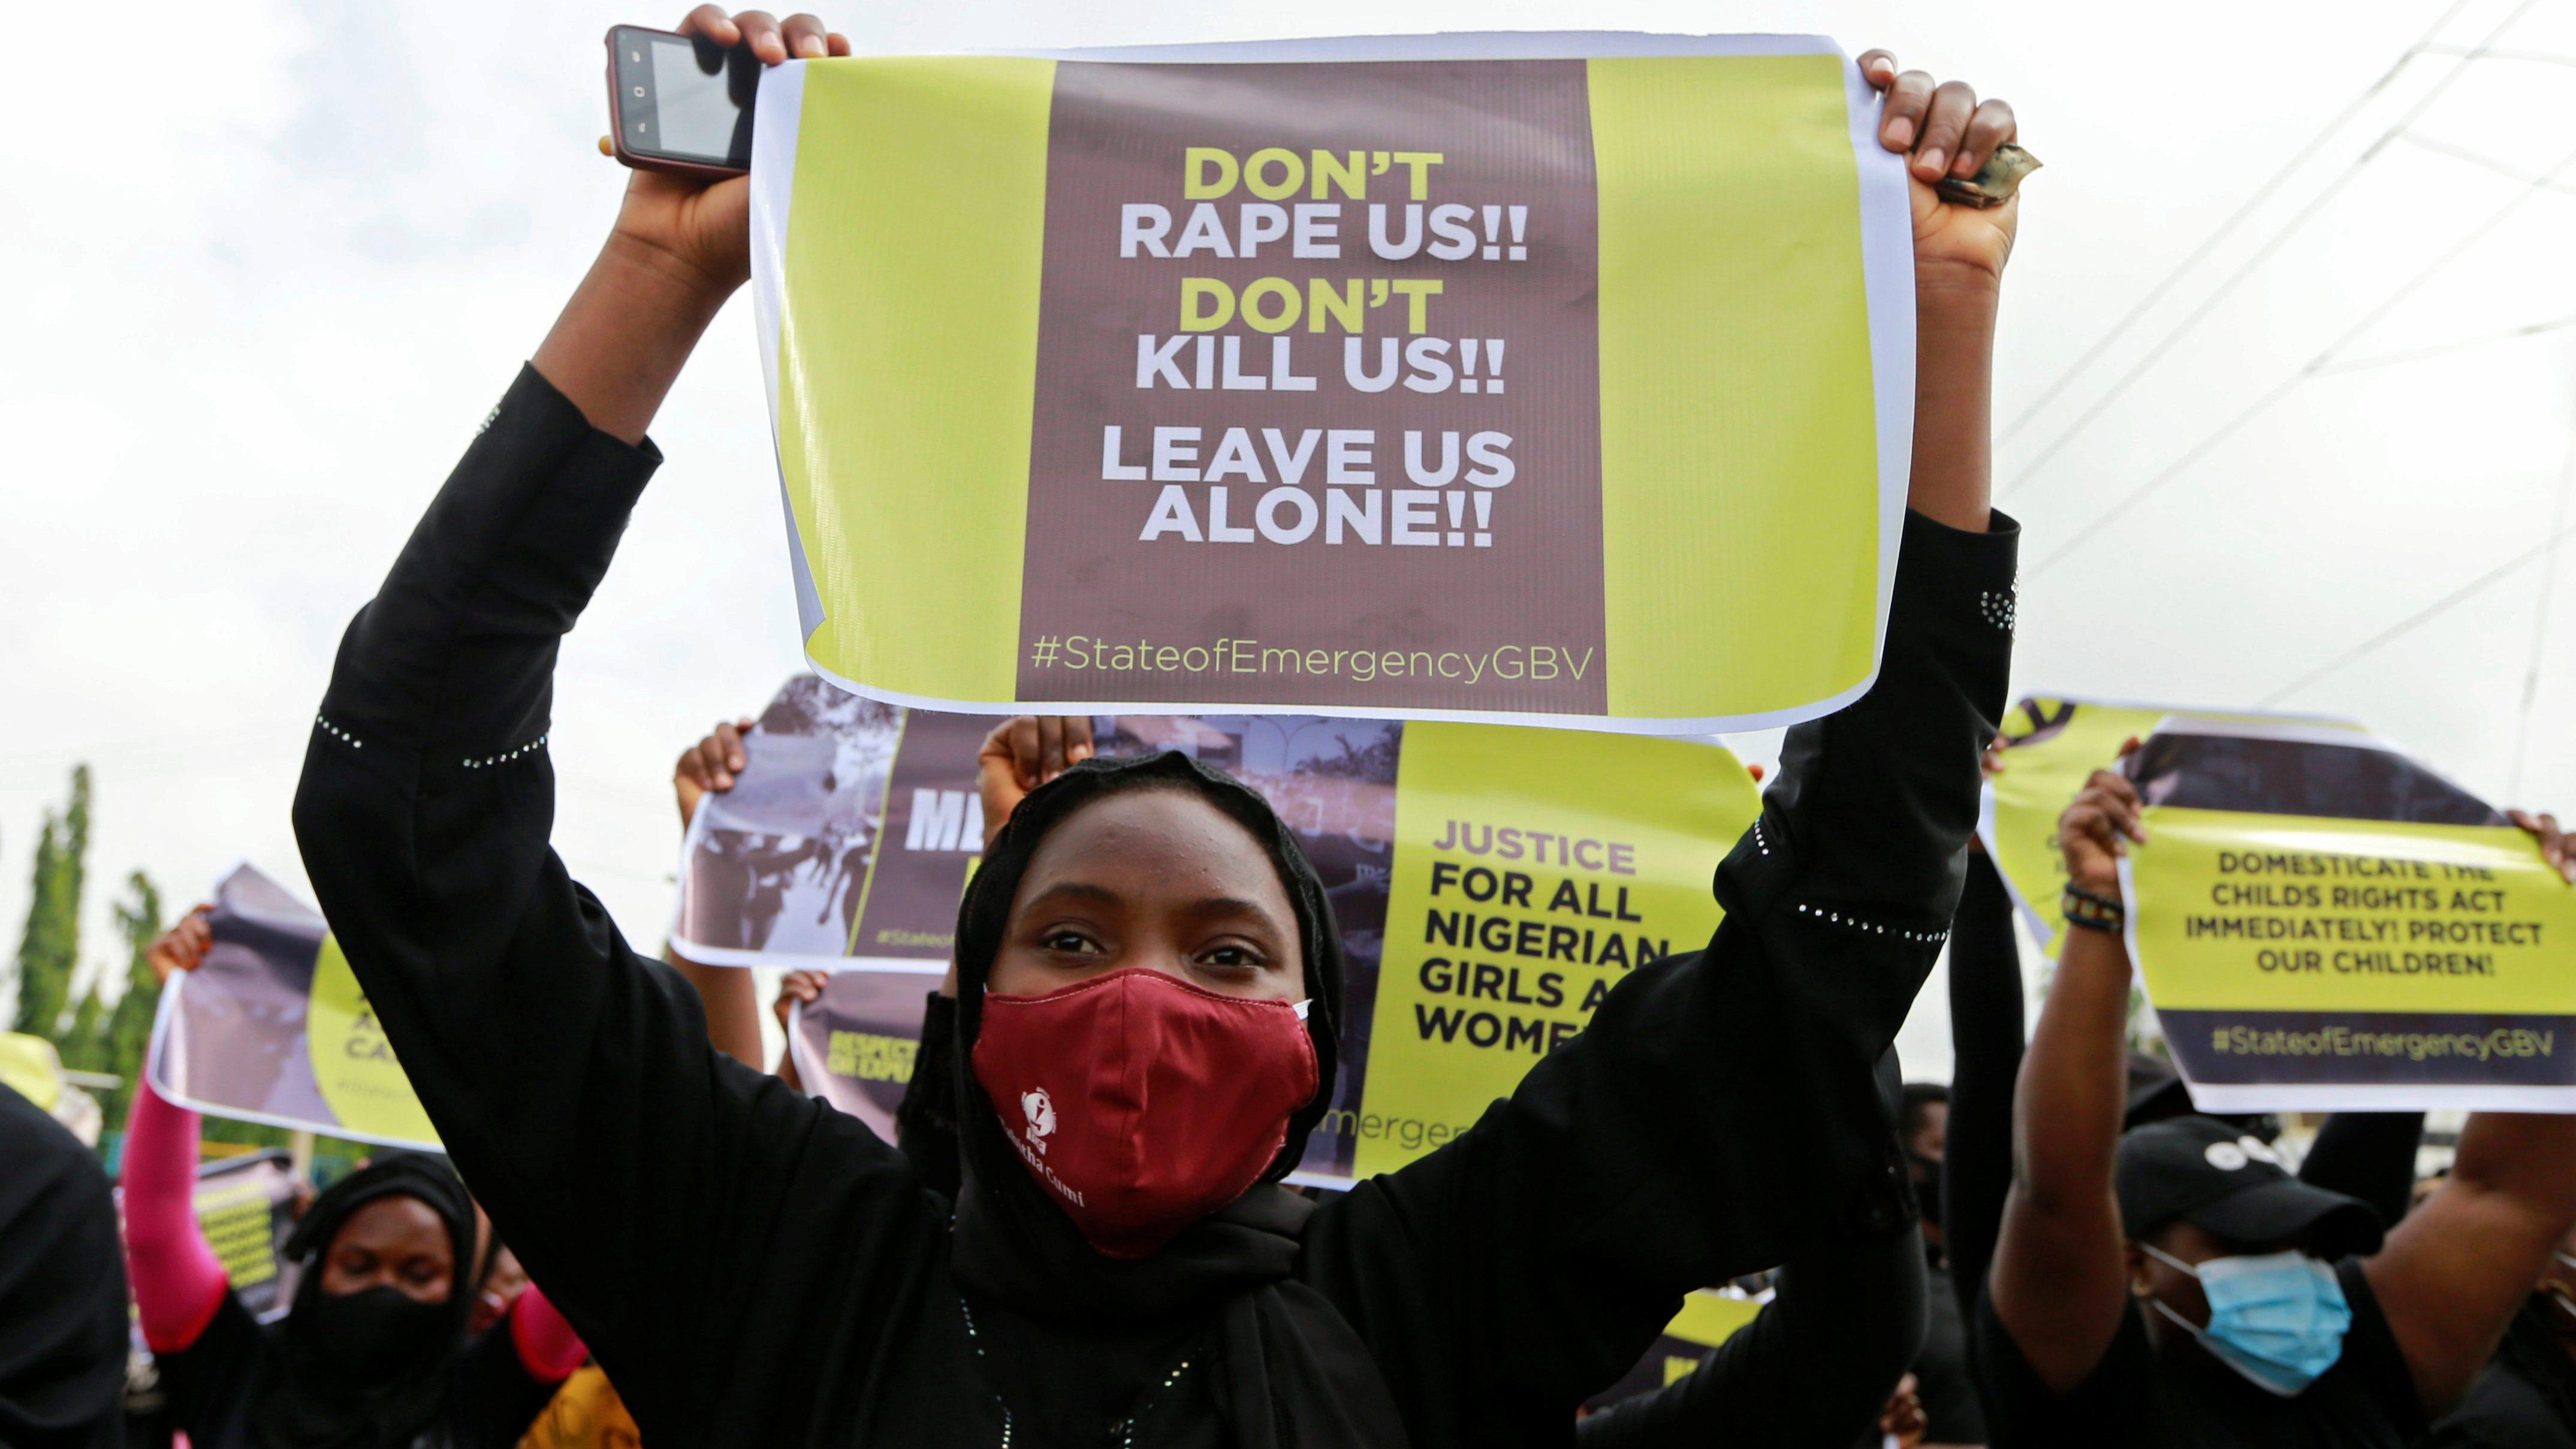 Nigerians confront rape culture crisis after Dbanj allegations - Quartz Africa